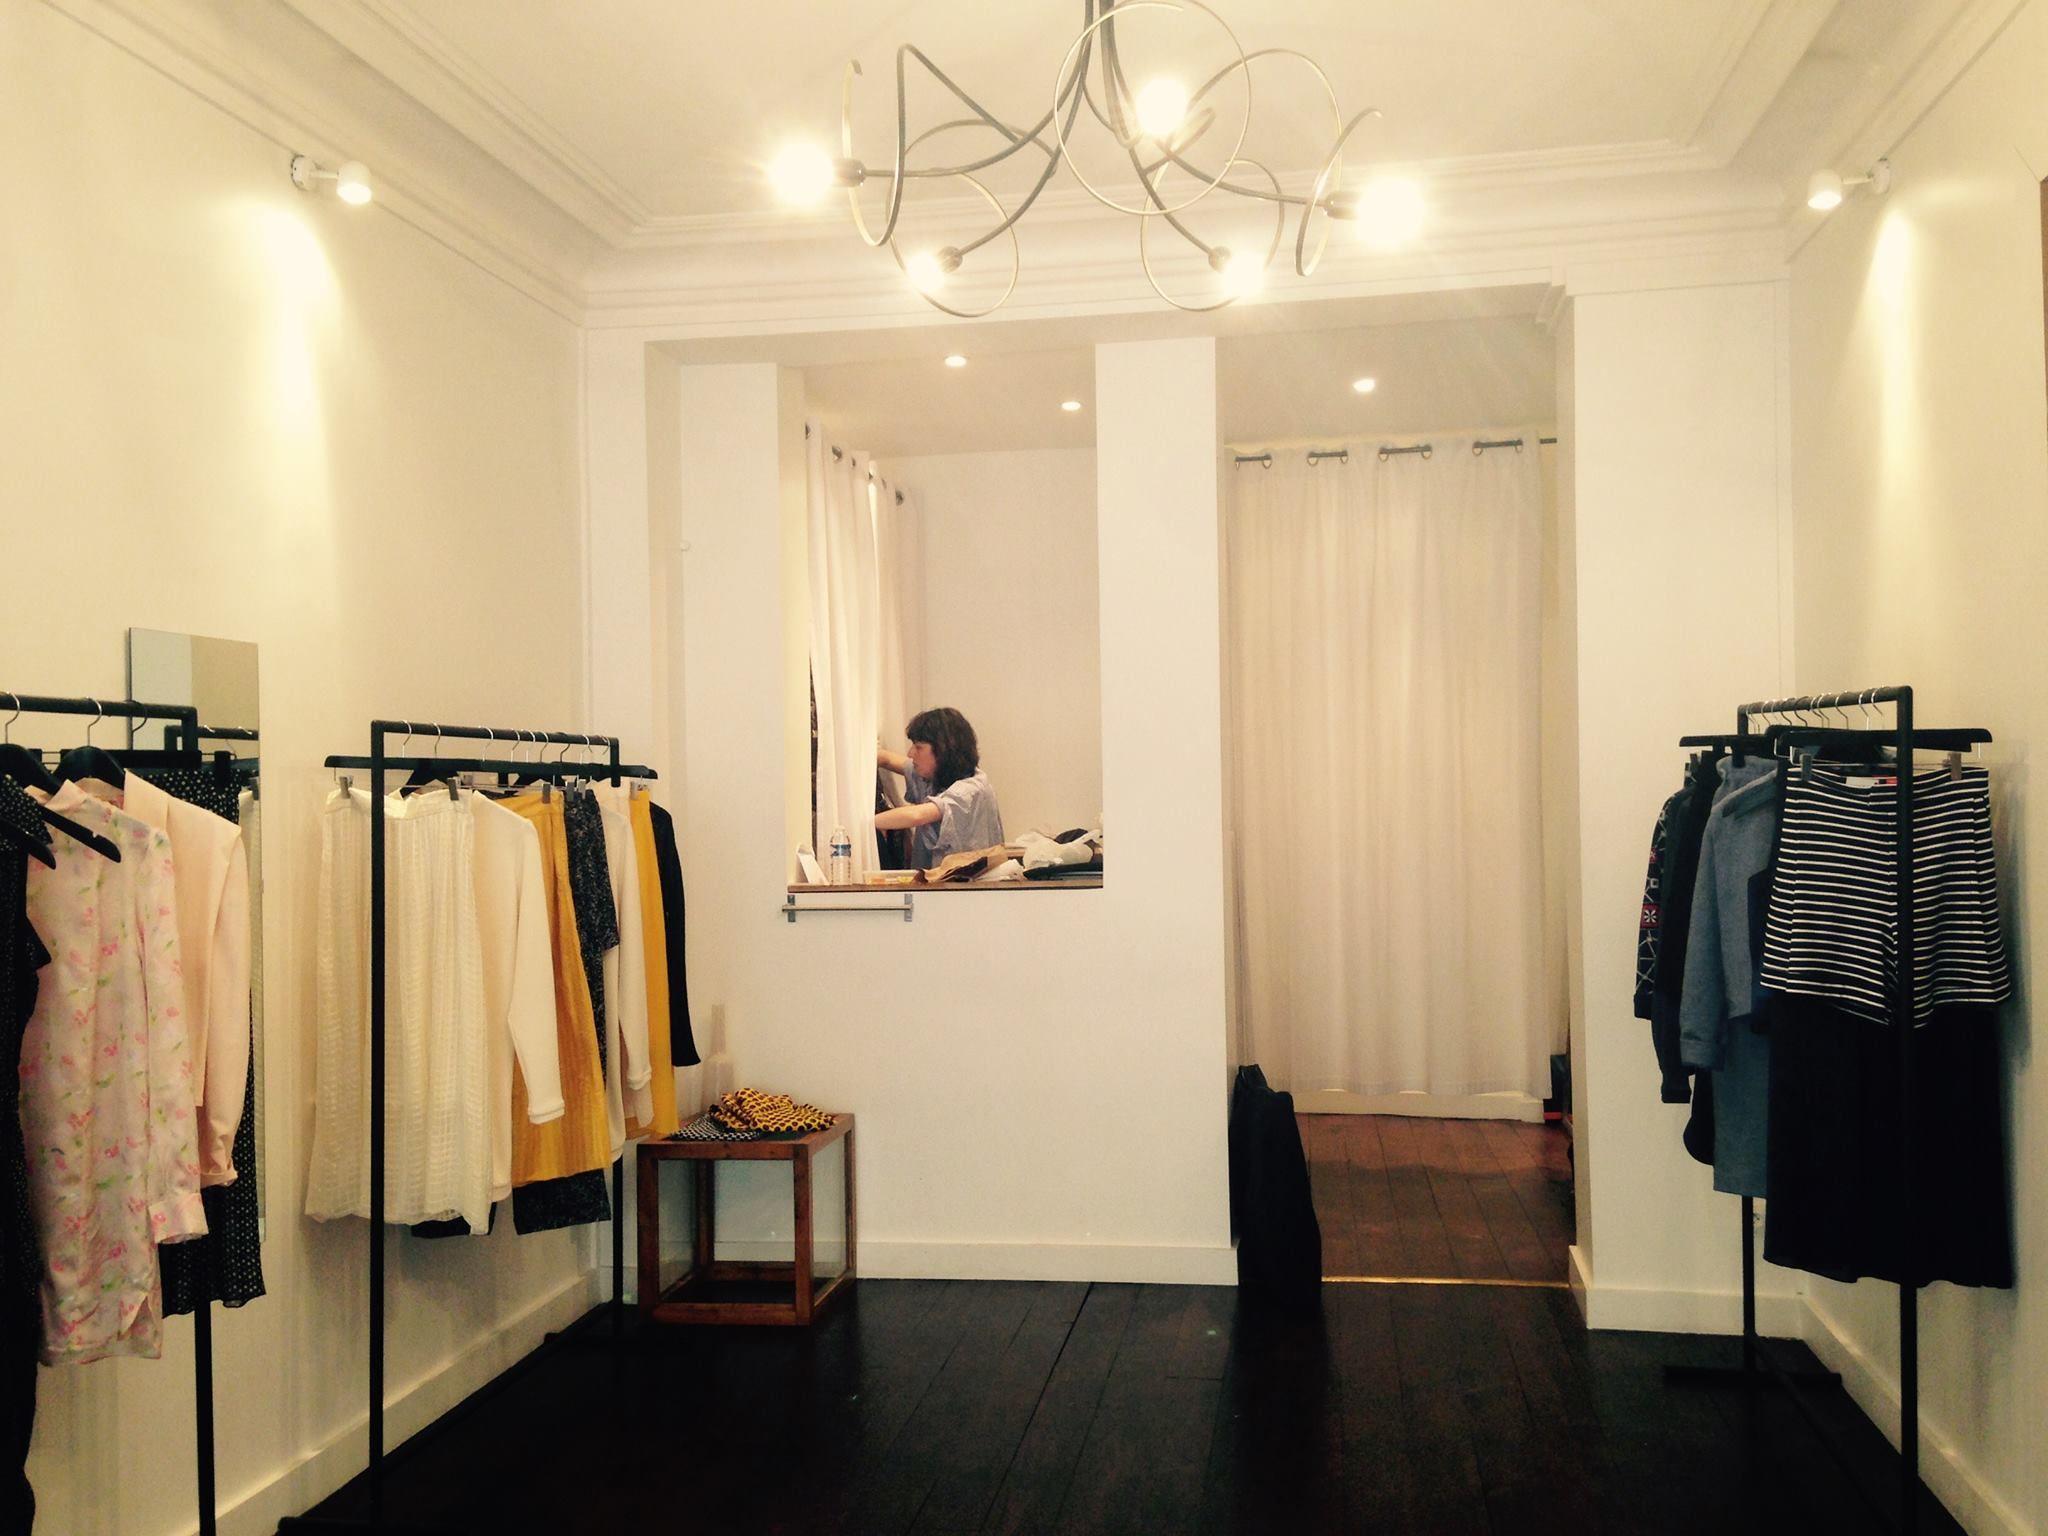 Boutique Zeit 70 rue des Matyrs 75009 Paris #zeit #zeitparis #zeitparisberlin #paris #berlin #fashion #ethical #look #collection